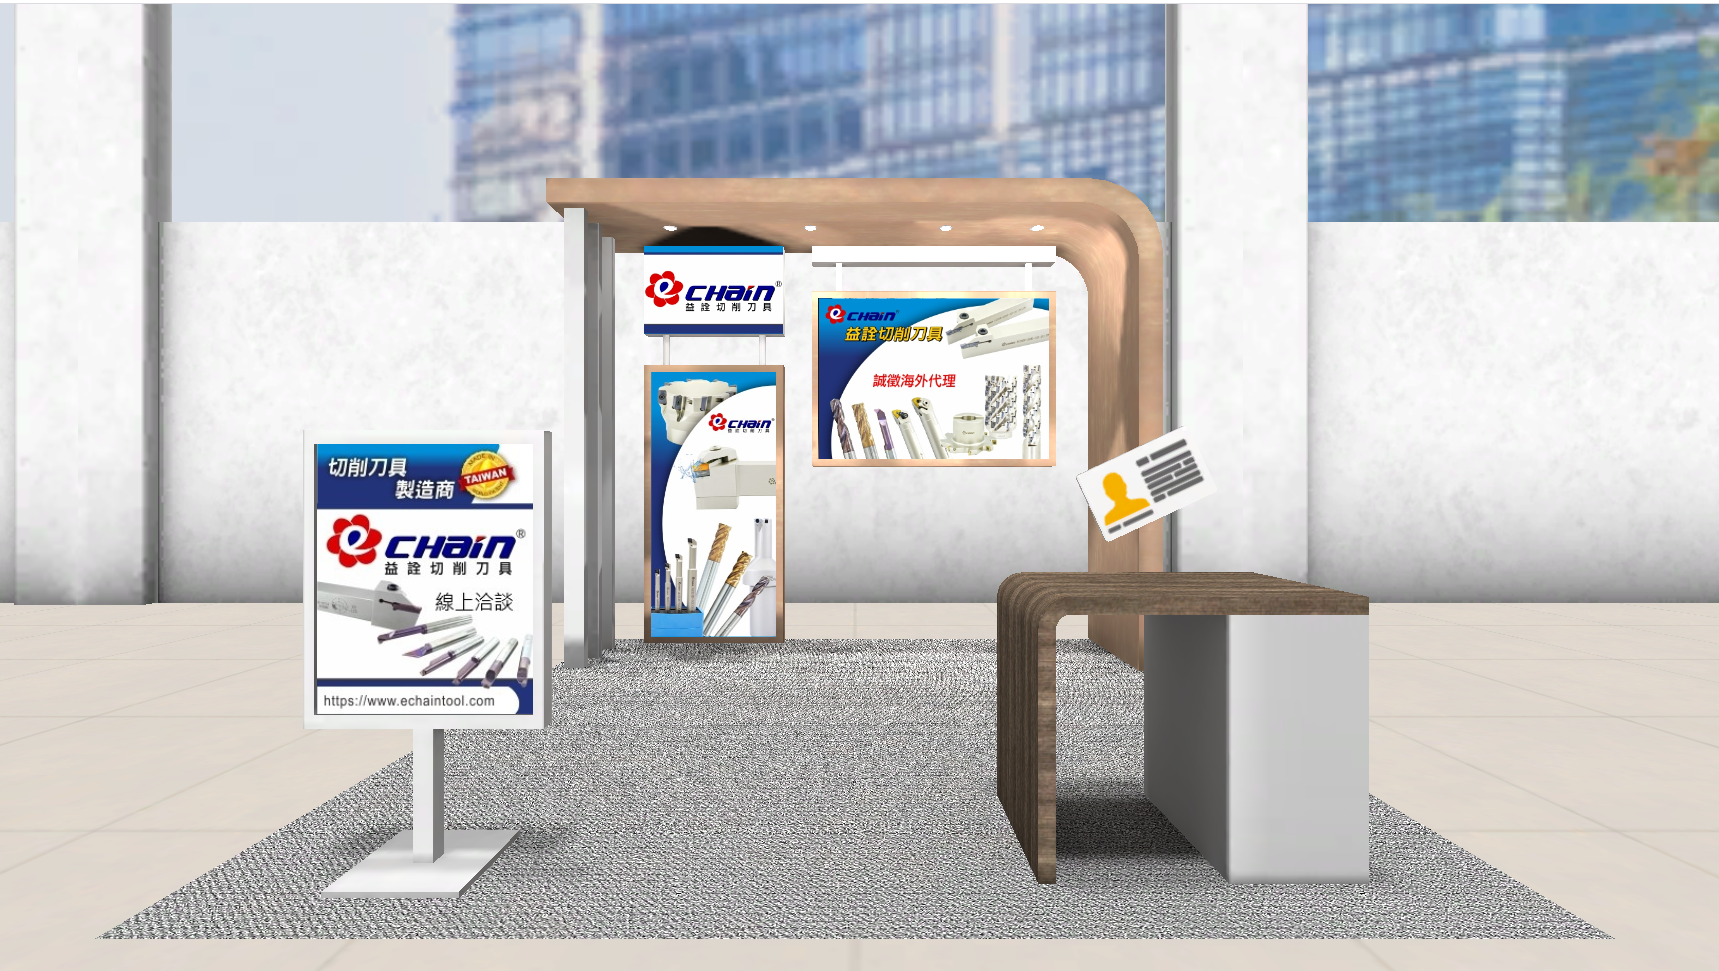 TIMTOS 2021 Hybrid Online Show with Echaintool in Taiwan